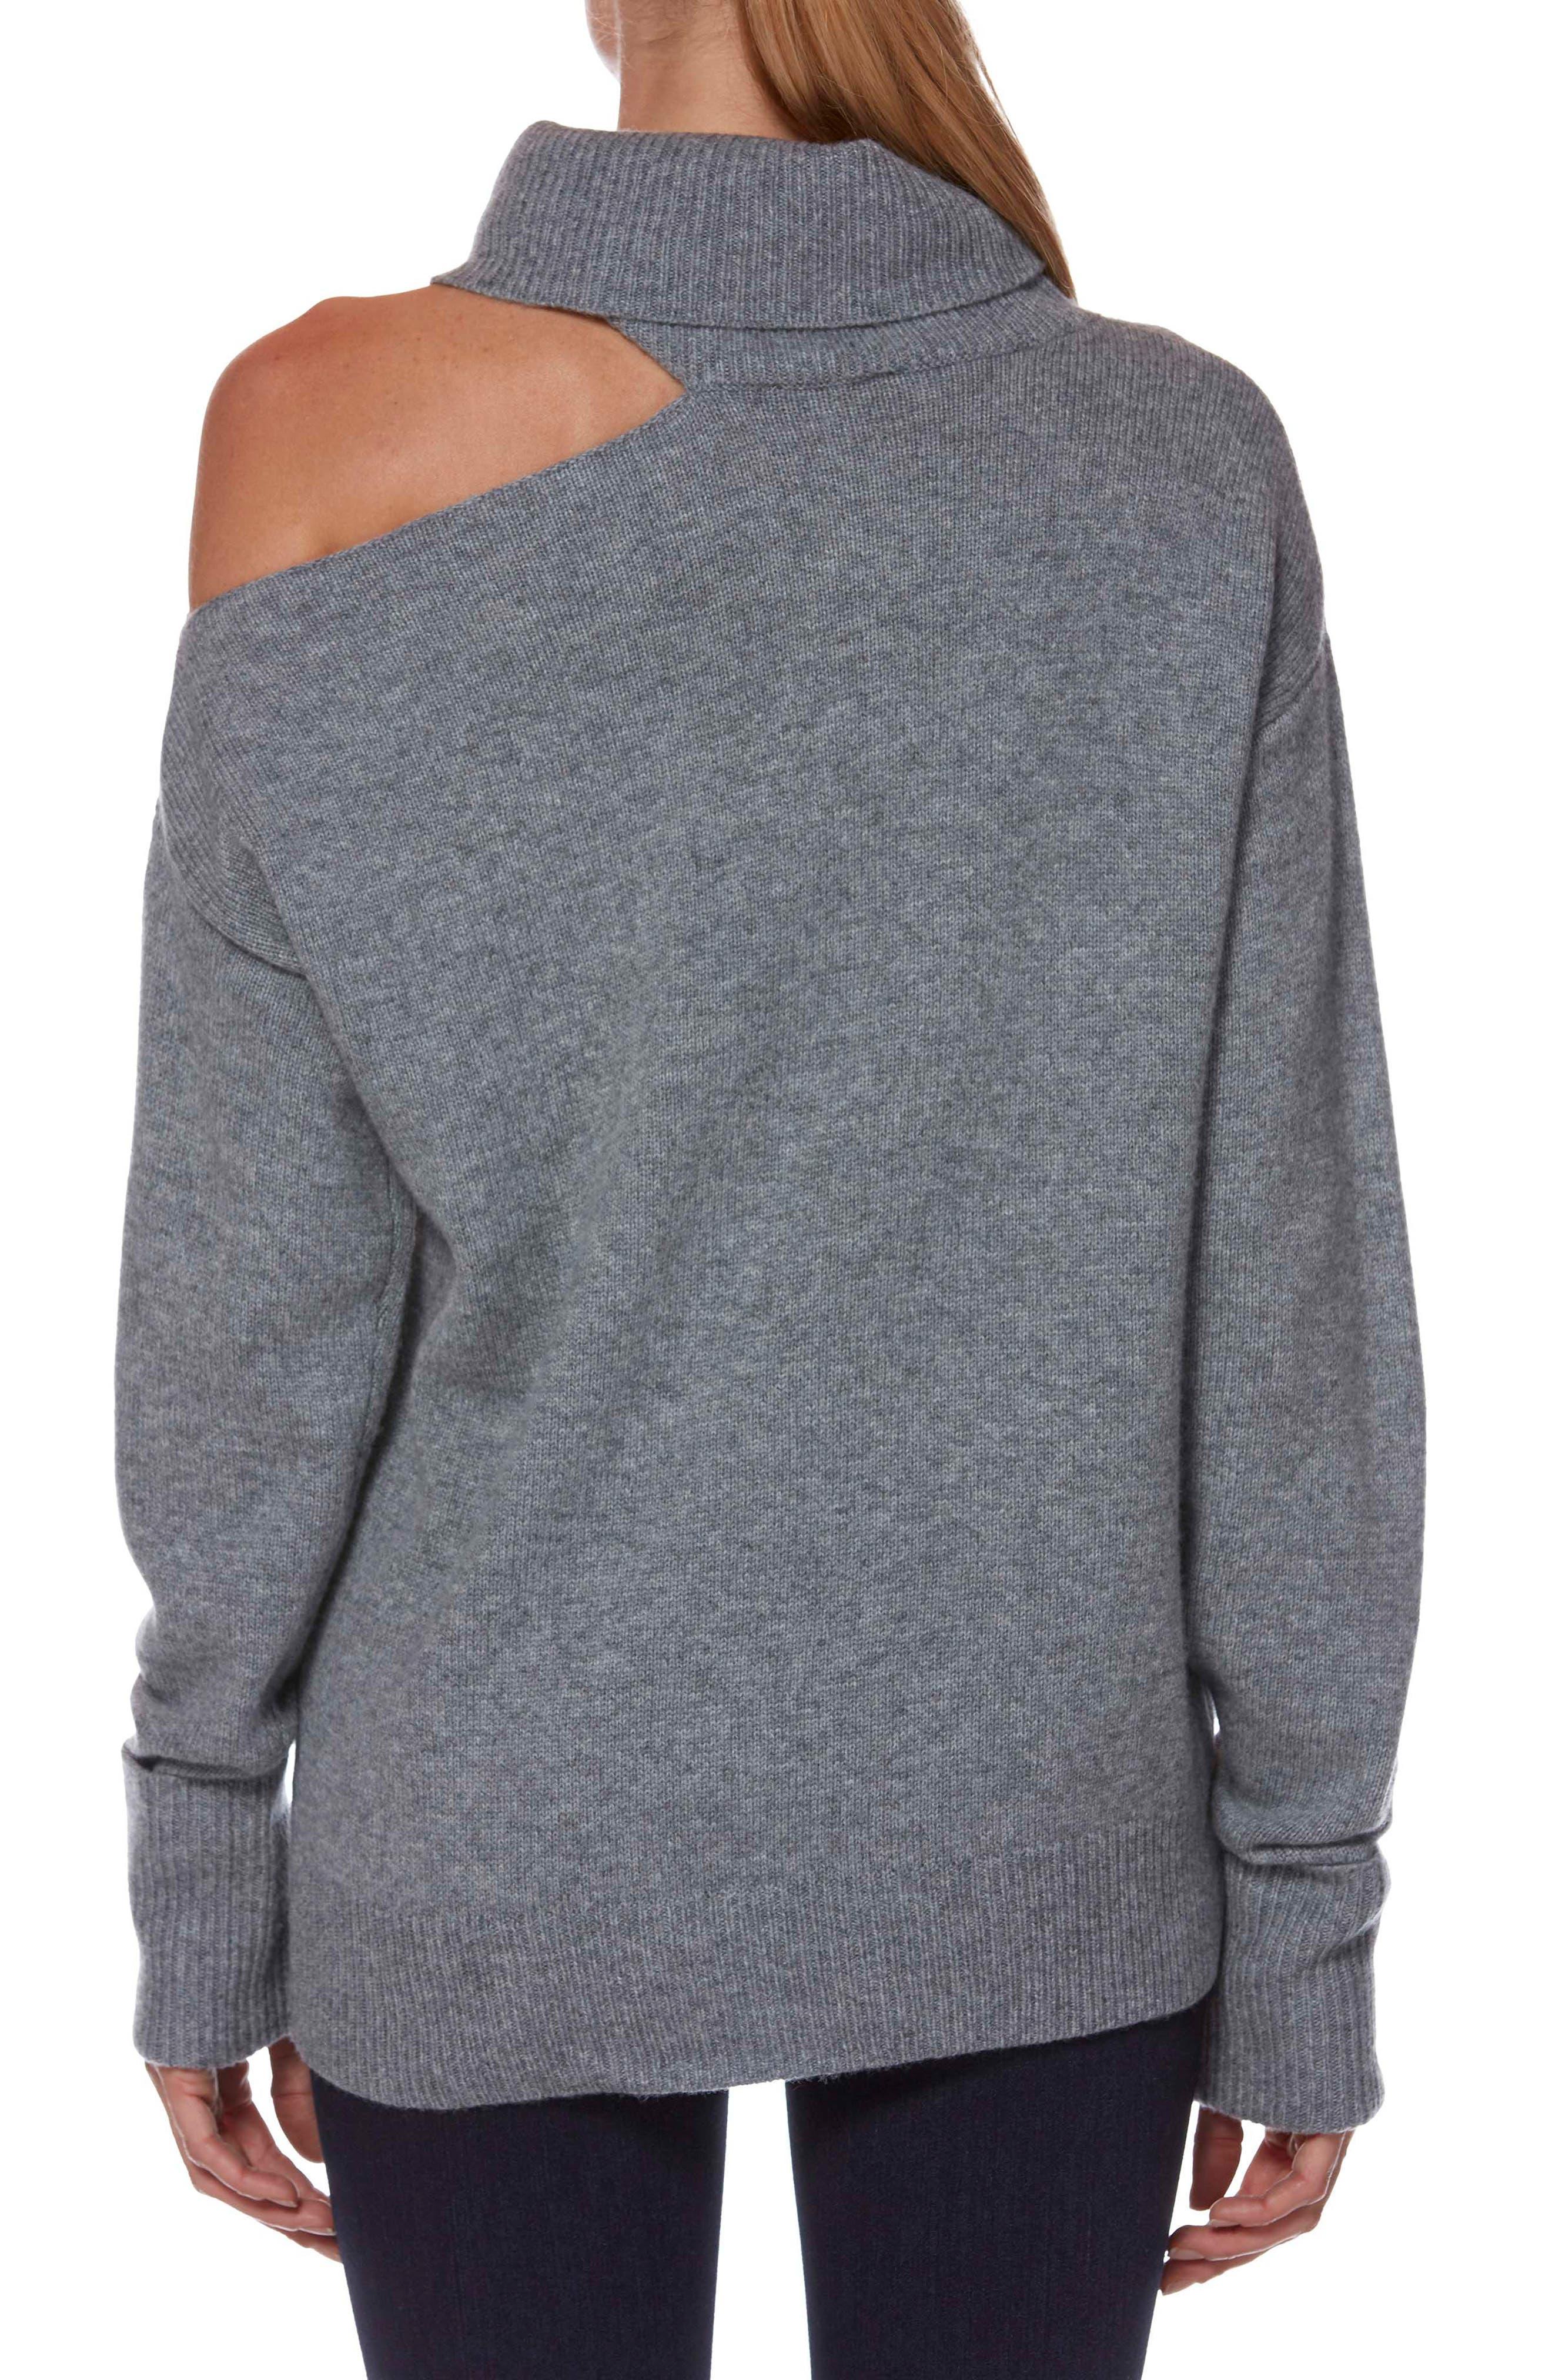 Raundi Cutout Shoulder Sweater,                             Alternate thumbnail 2, color,                             HEATHER GREY